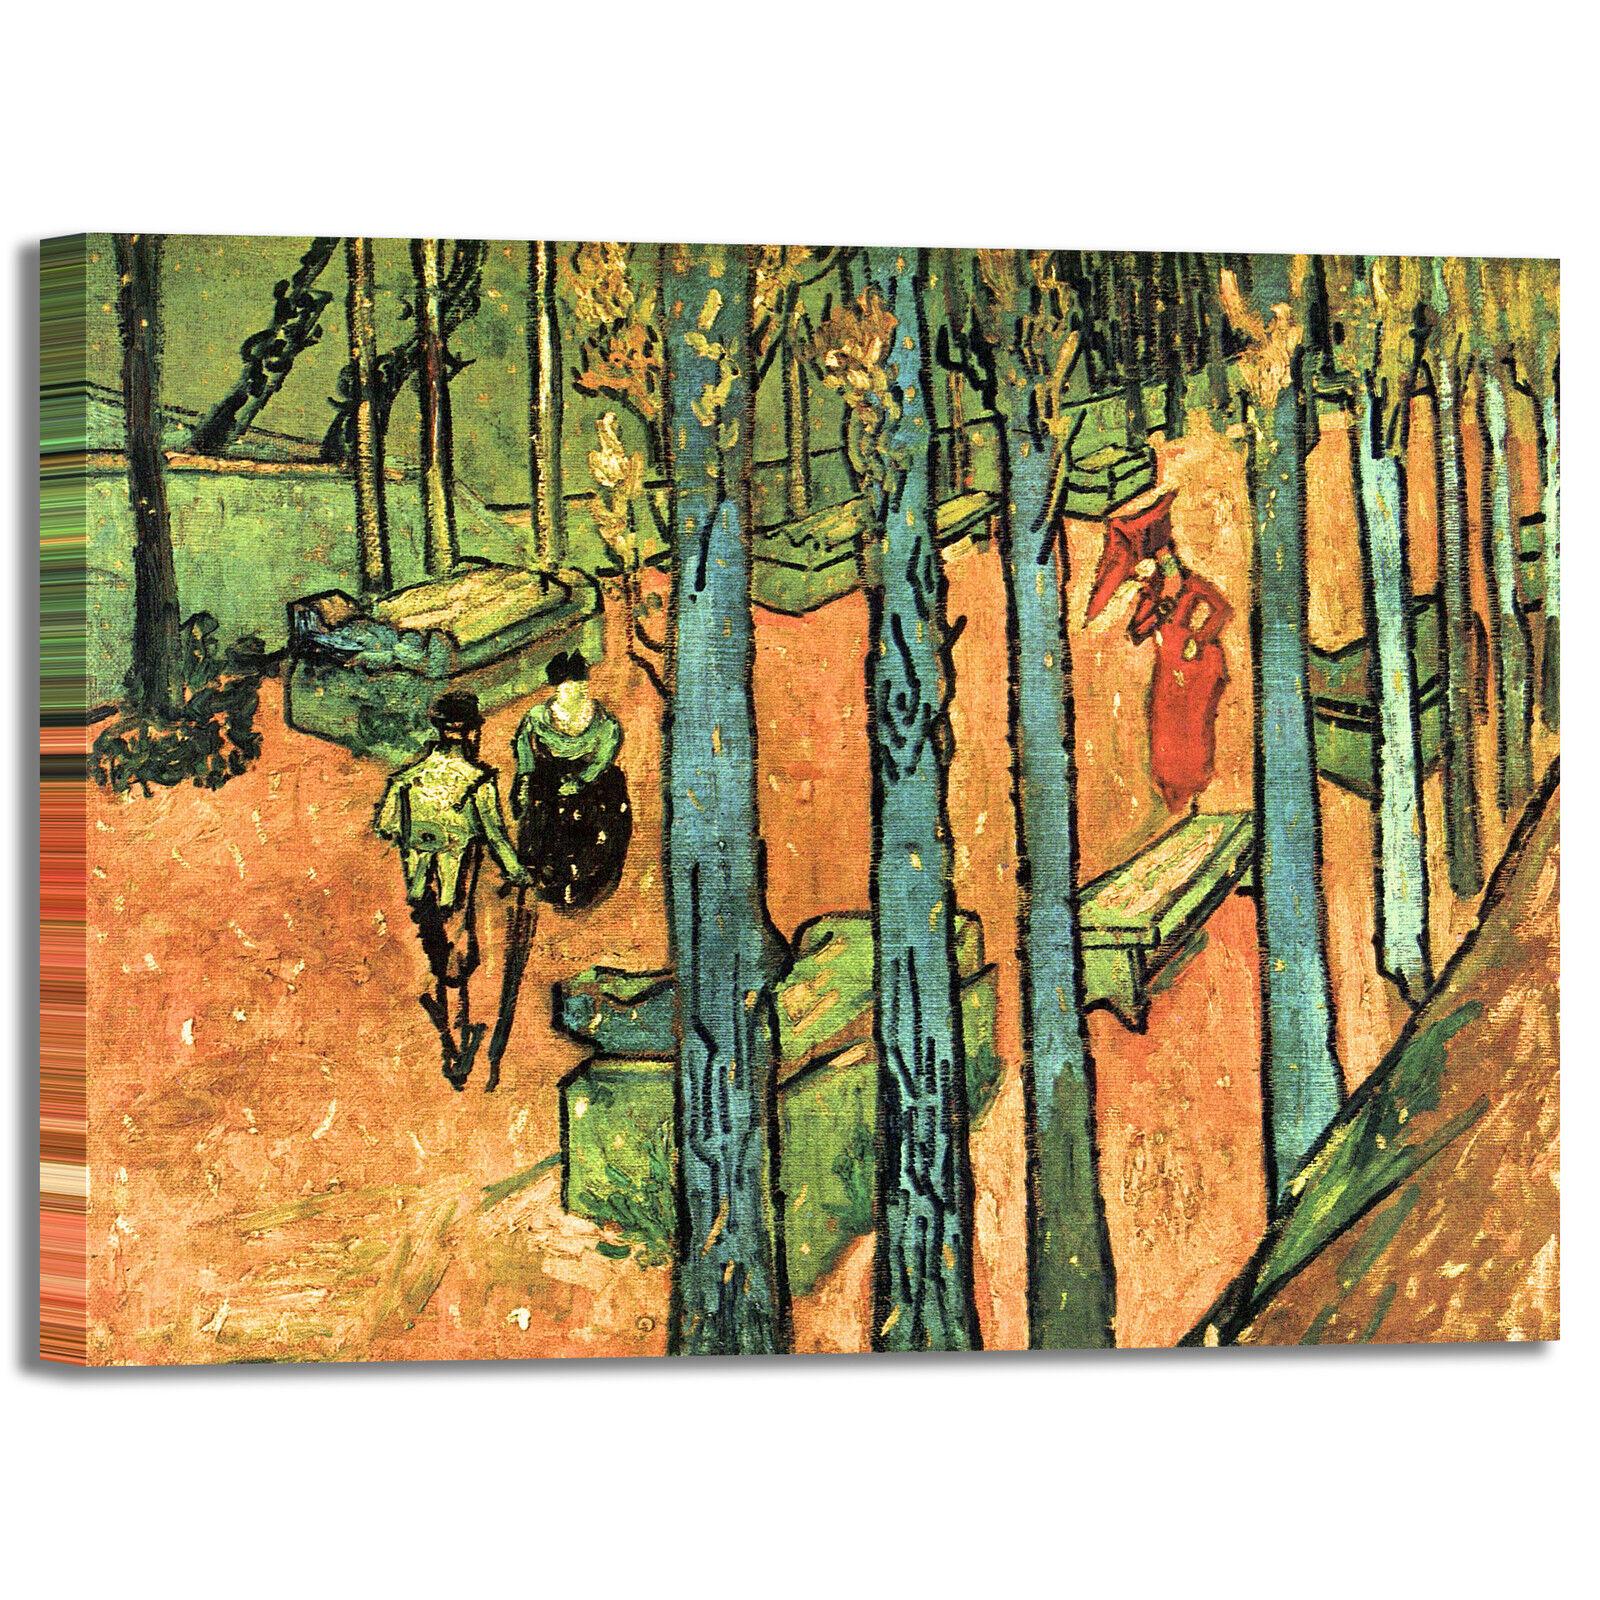 Van Gogh les alyscamps design quadro stampa tela dipinto telaio arroto casa